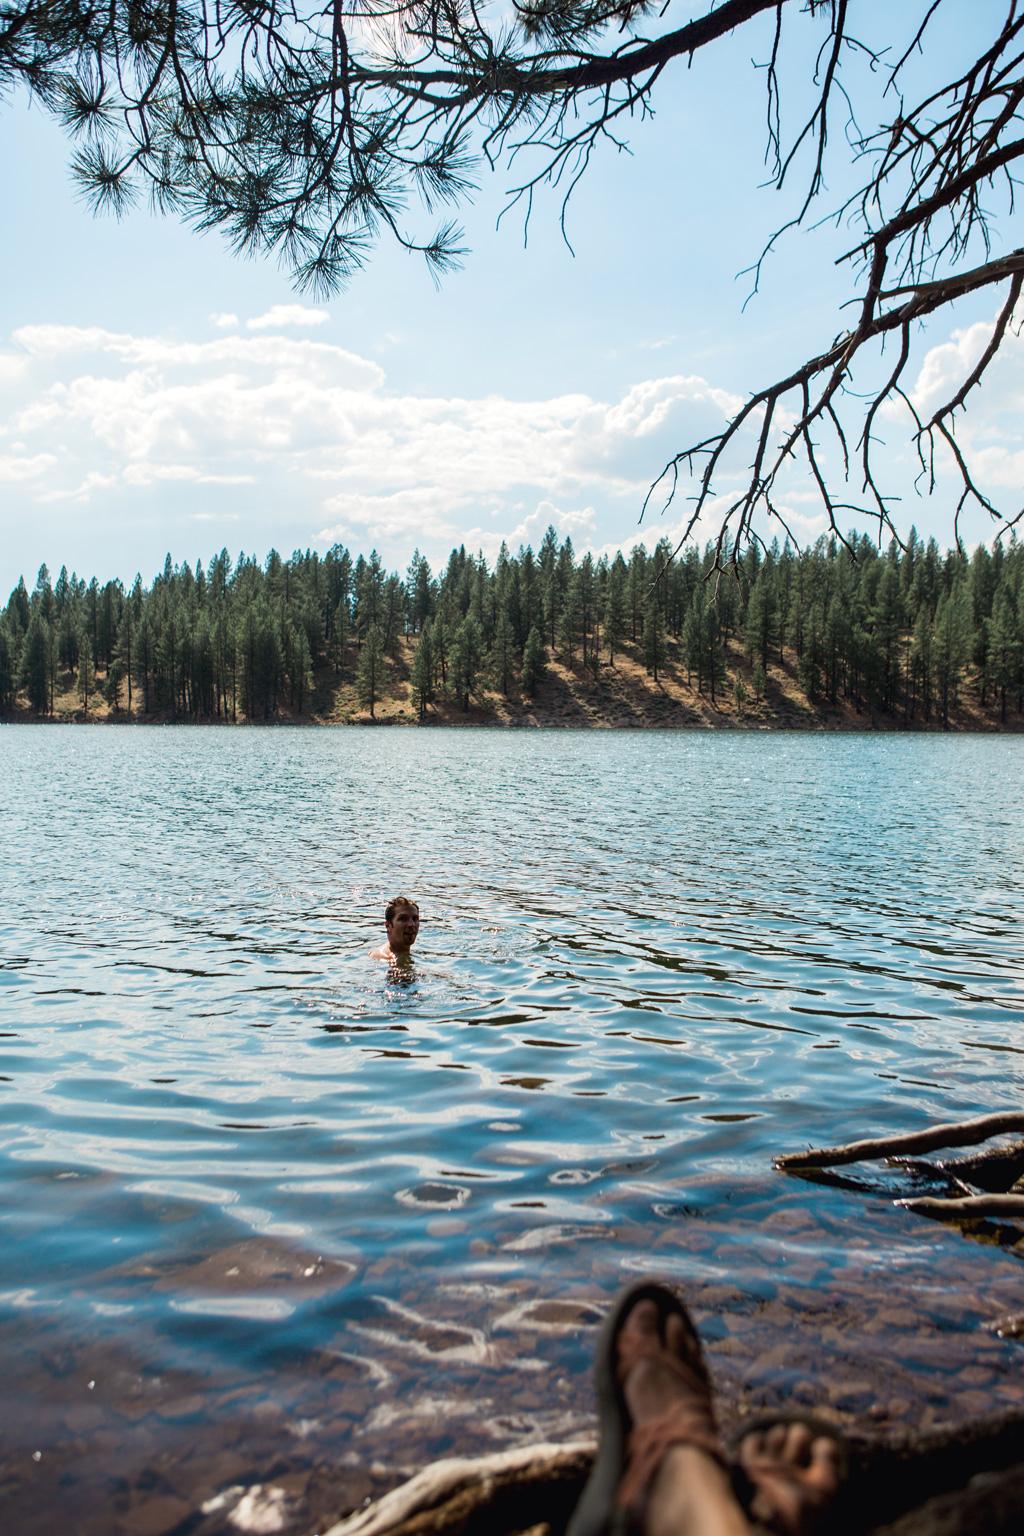 CindyGiovagnoli_Reno_Tahoe_Nevada_Boca_Stampede_Reservoir_outdoors_summer_swimming_hammock-006.jpg